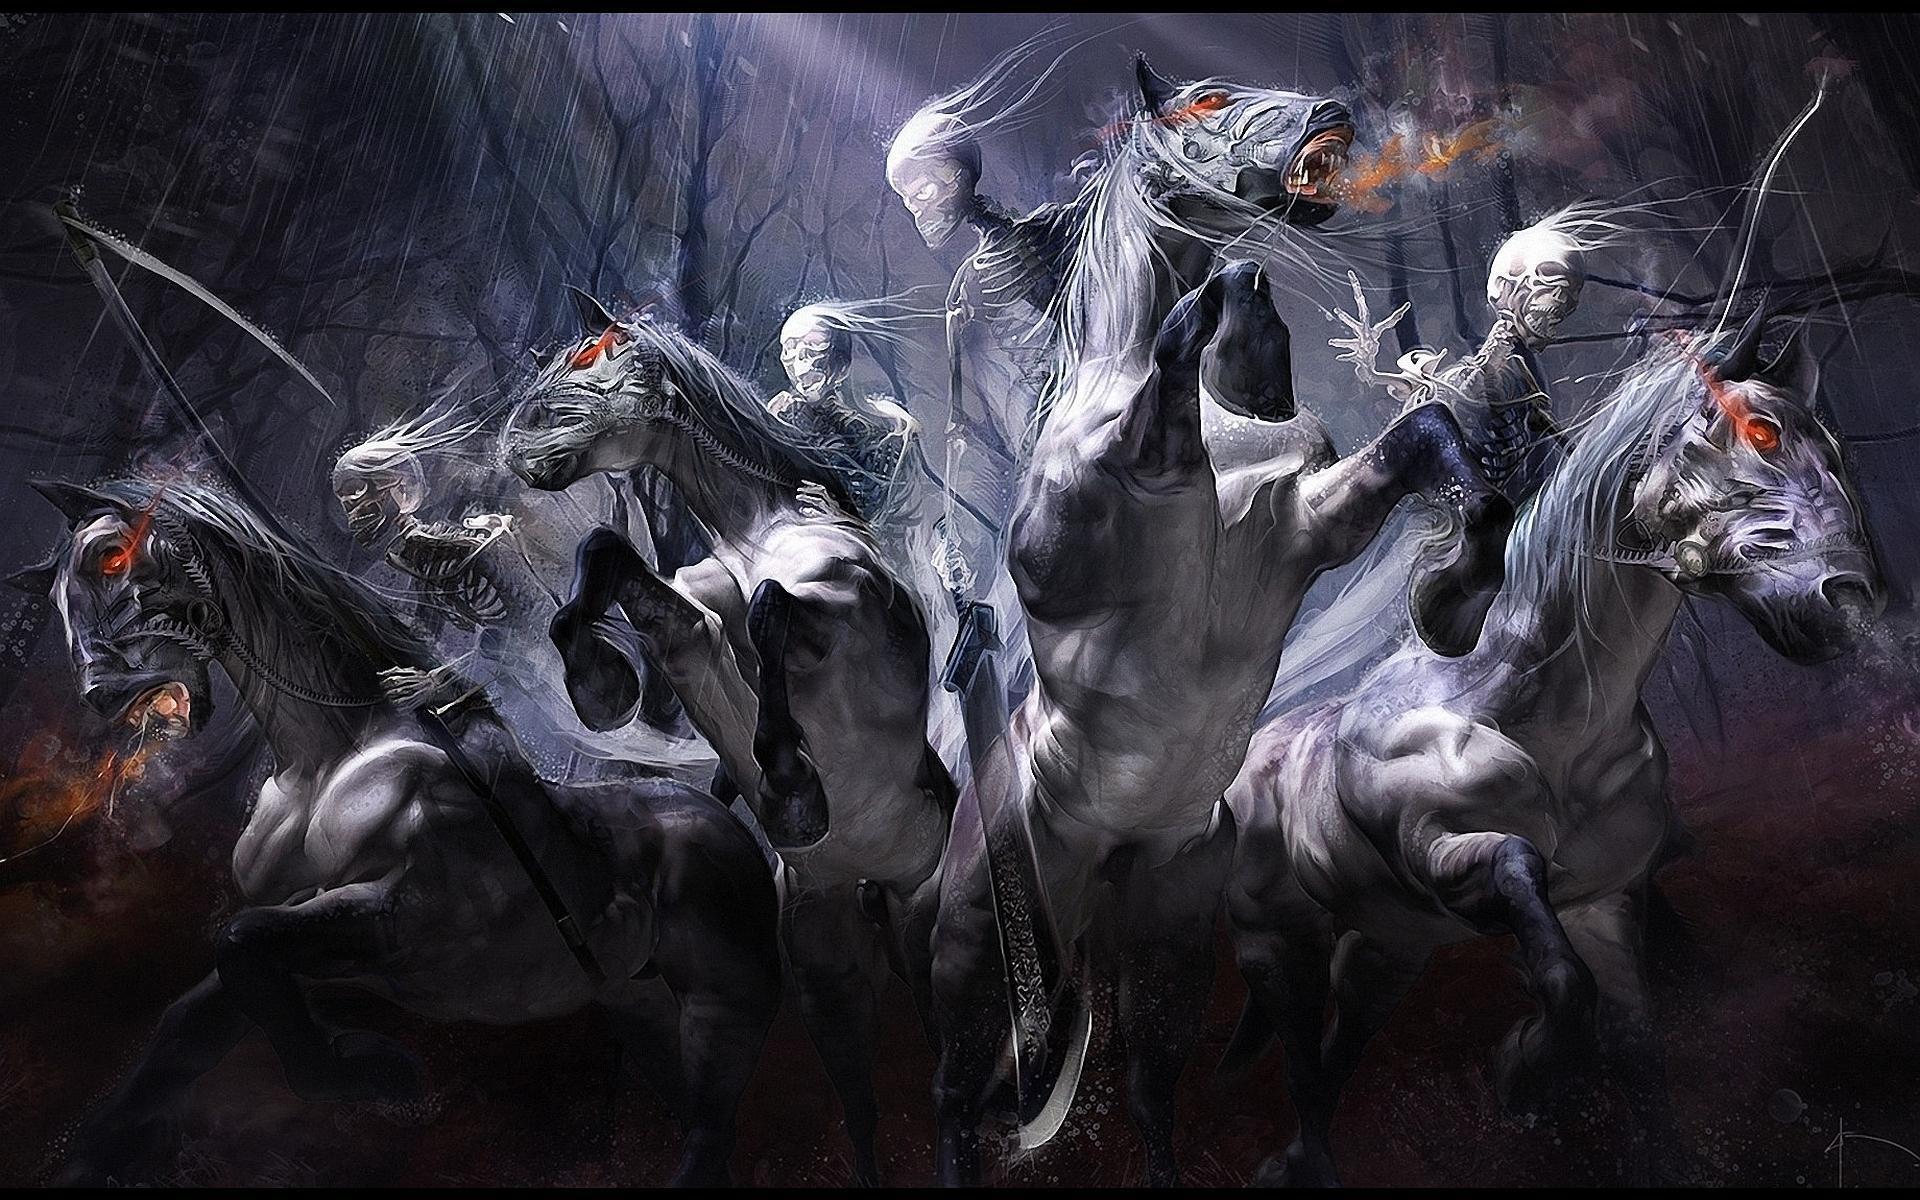 Four Horsemen Wallpapers - Wallpaper Cave